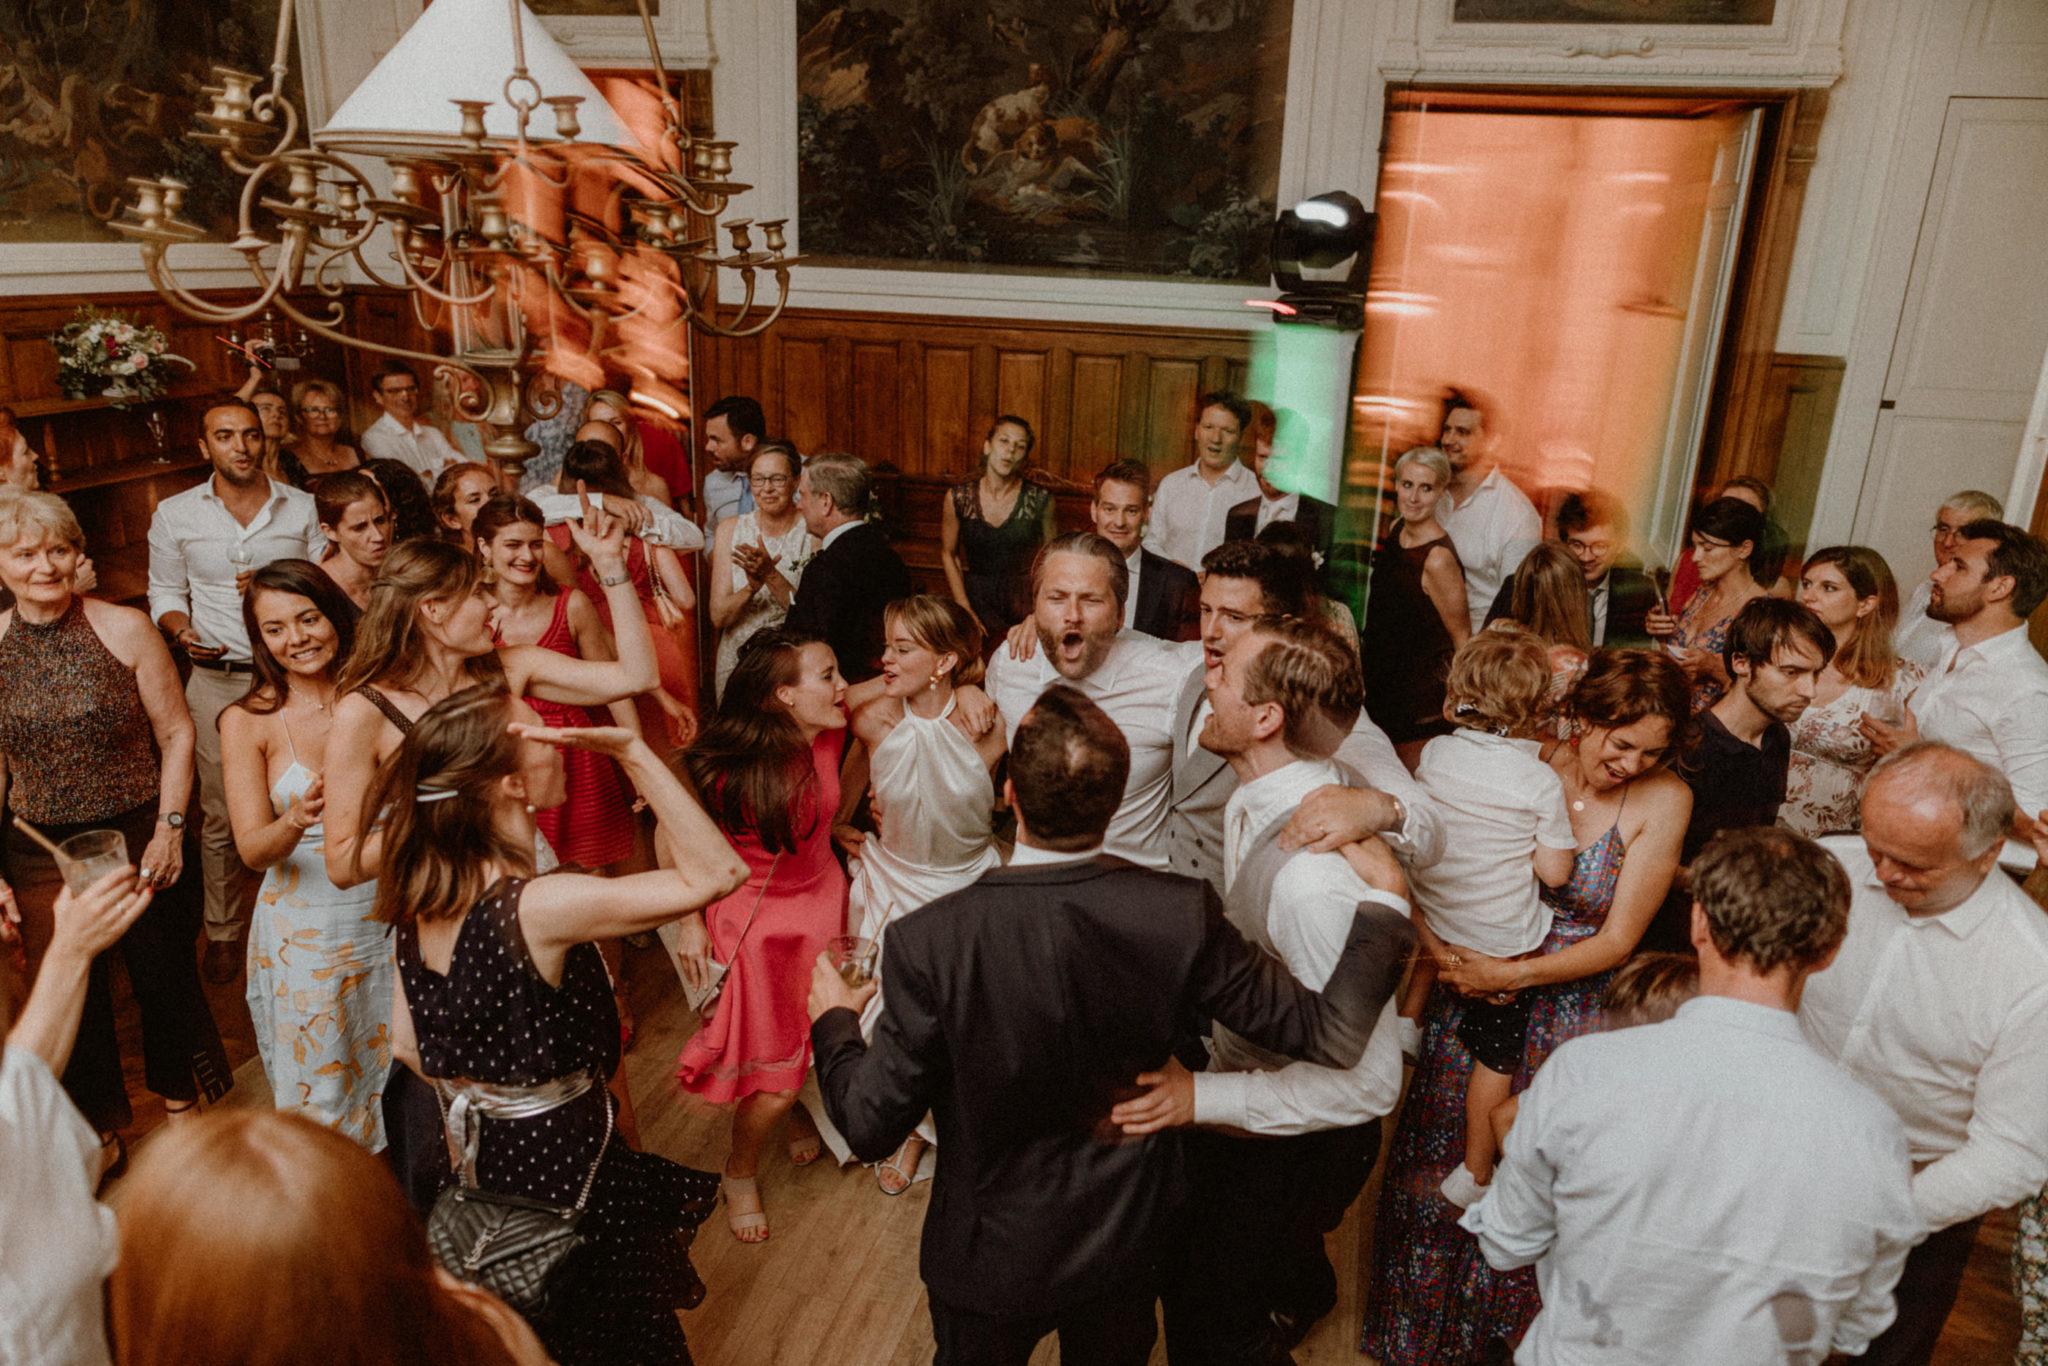 dancefloor au chateau d'azy